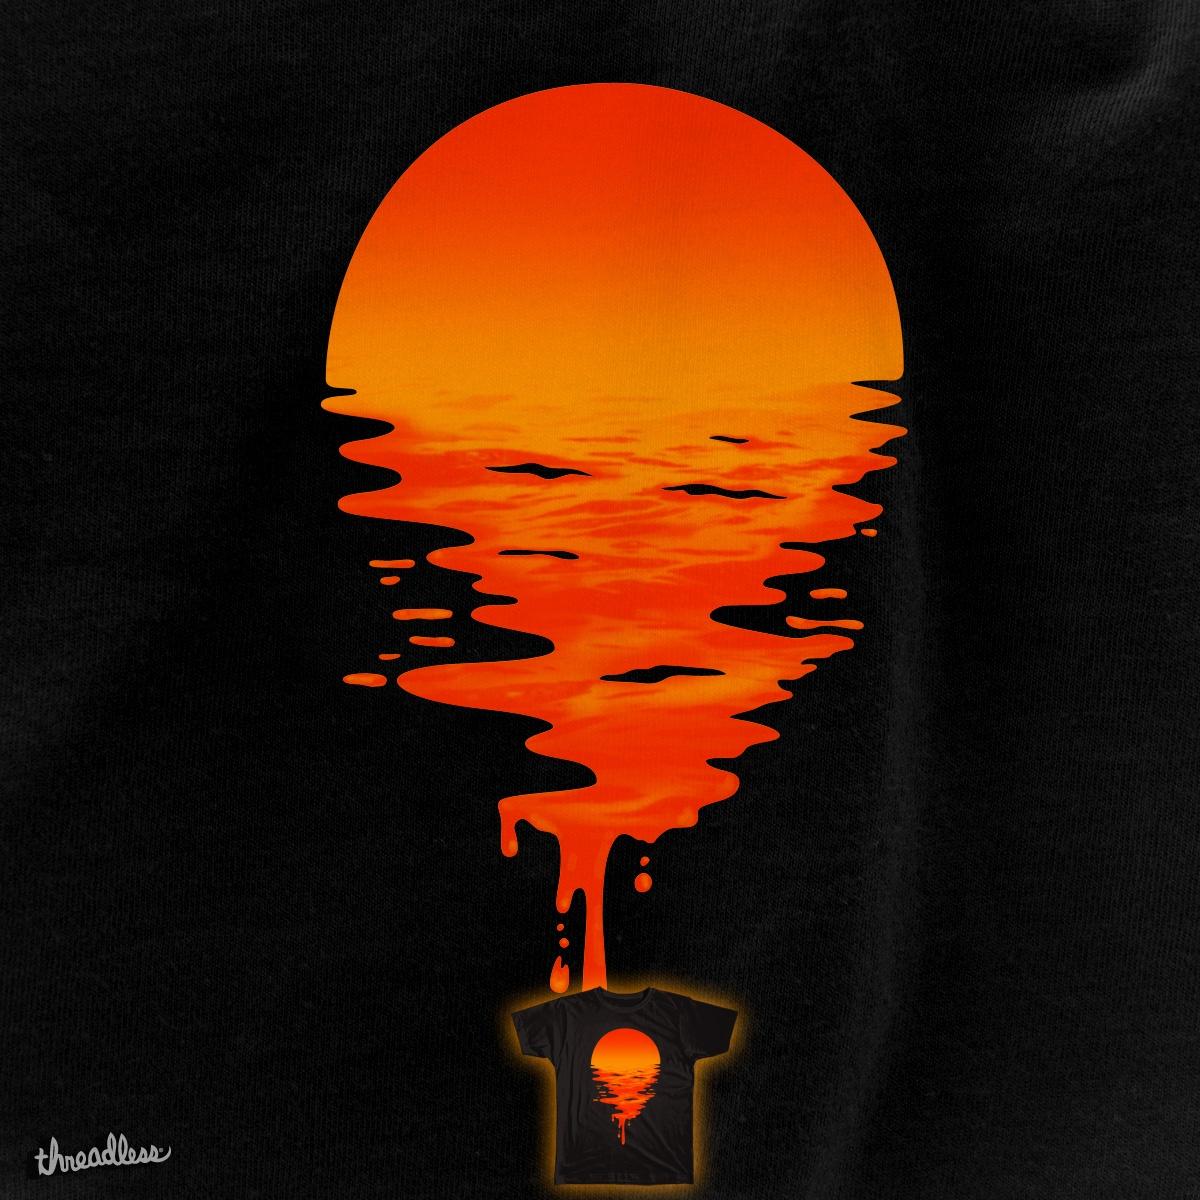 Sunset 6 by ivanrodero on Threadless